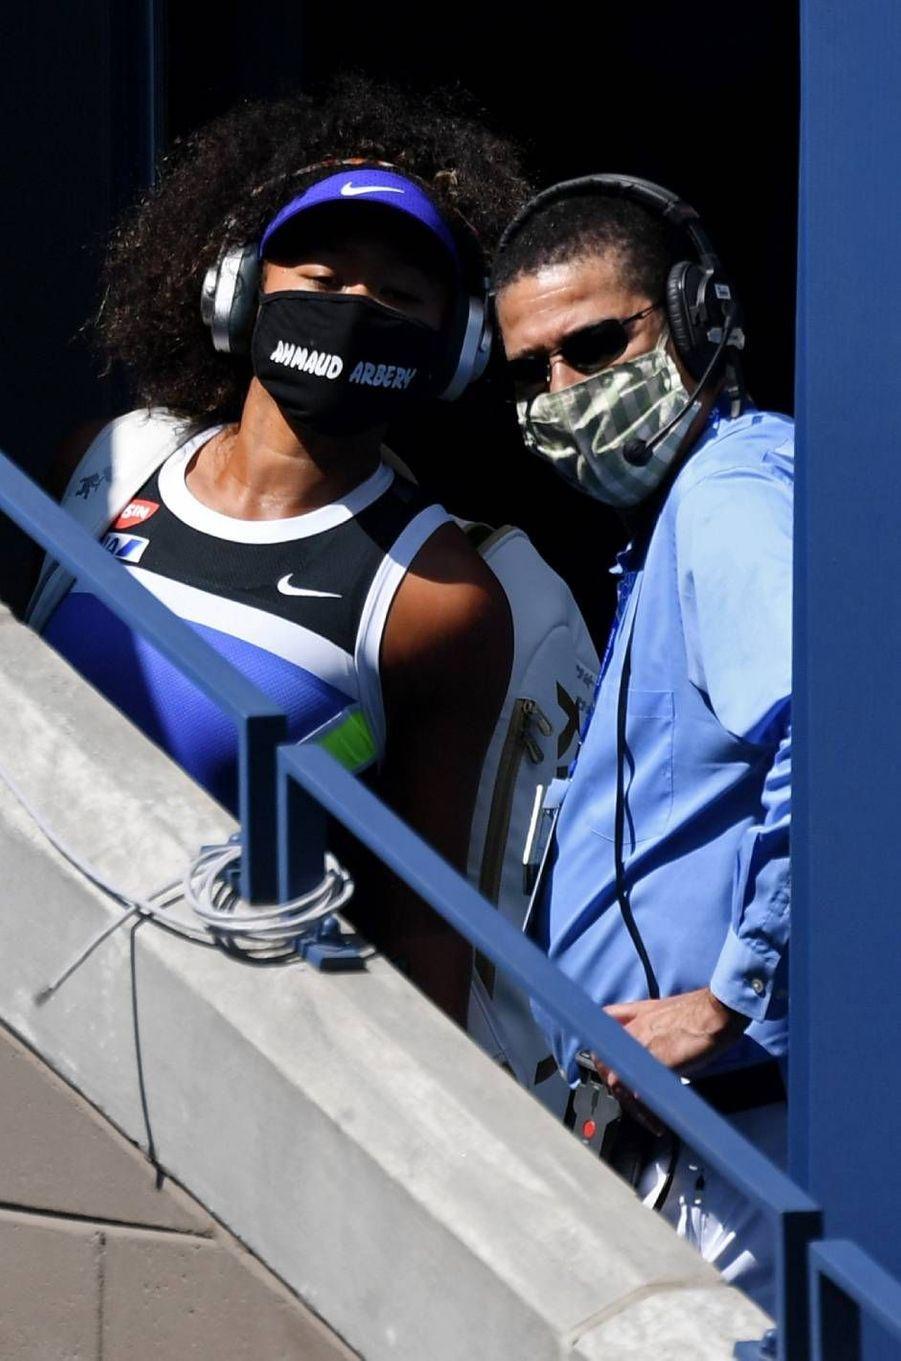 Naomi Osaka portant un masque rendant hommage à Ahmaud Arbery, le 4 septembre 2020.